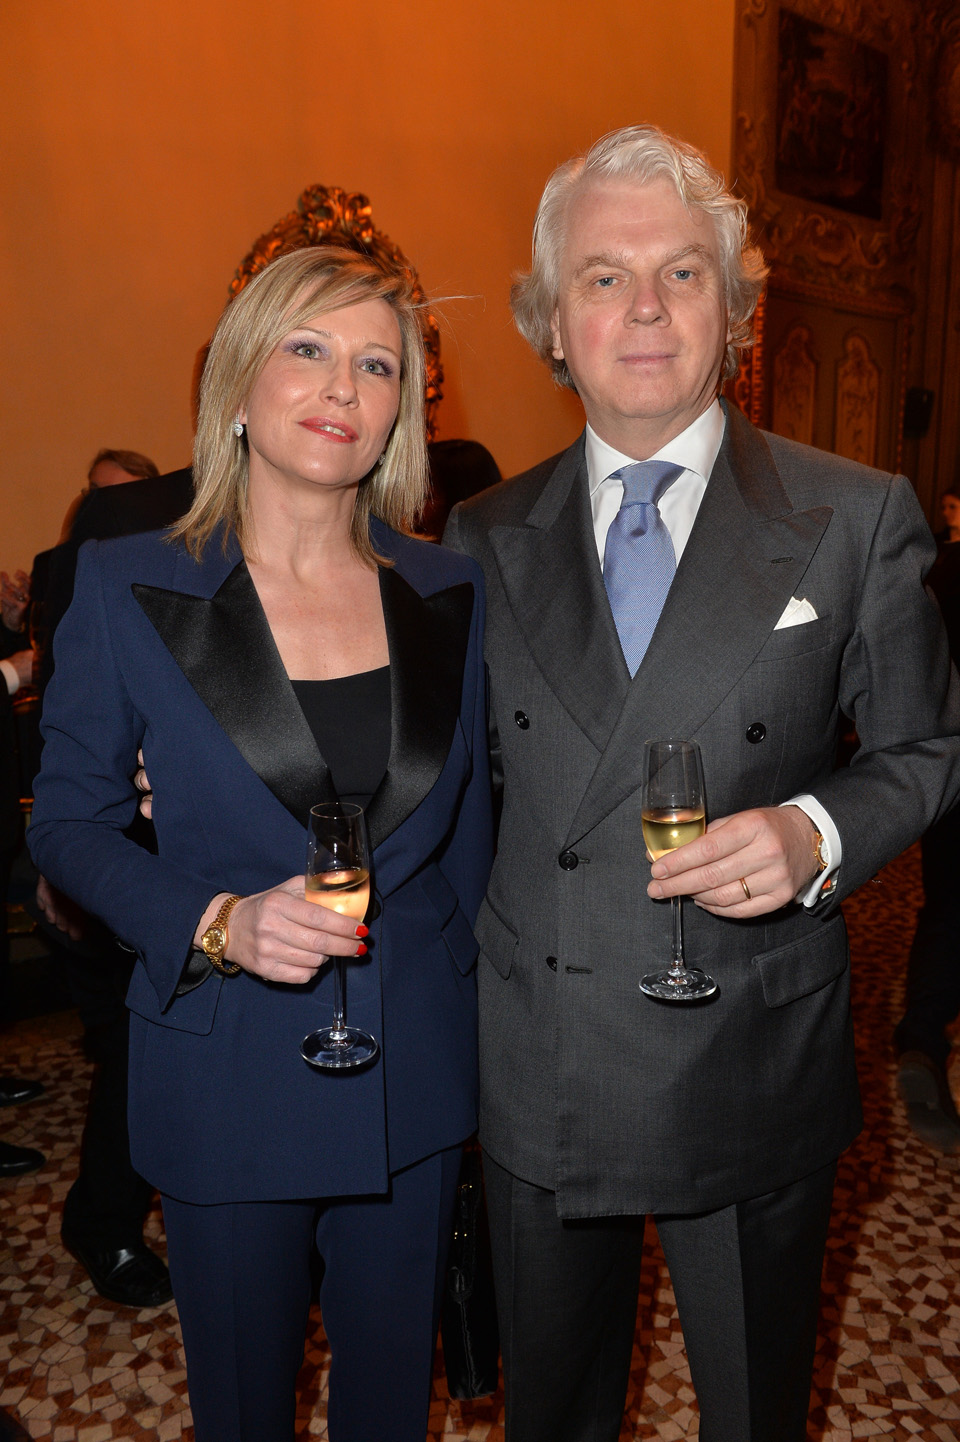 Caterina Rinero & Dario Rinero